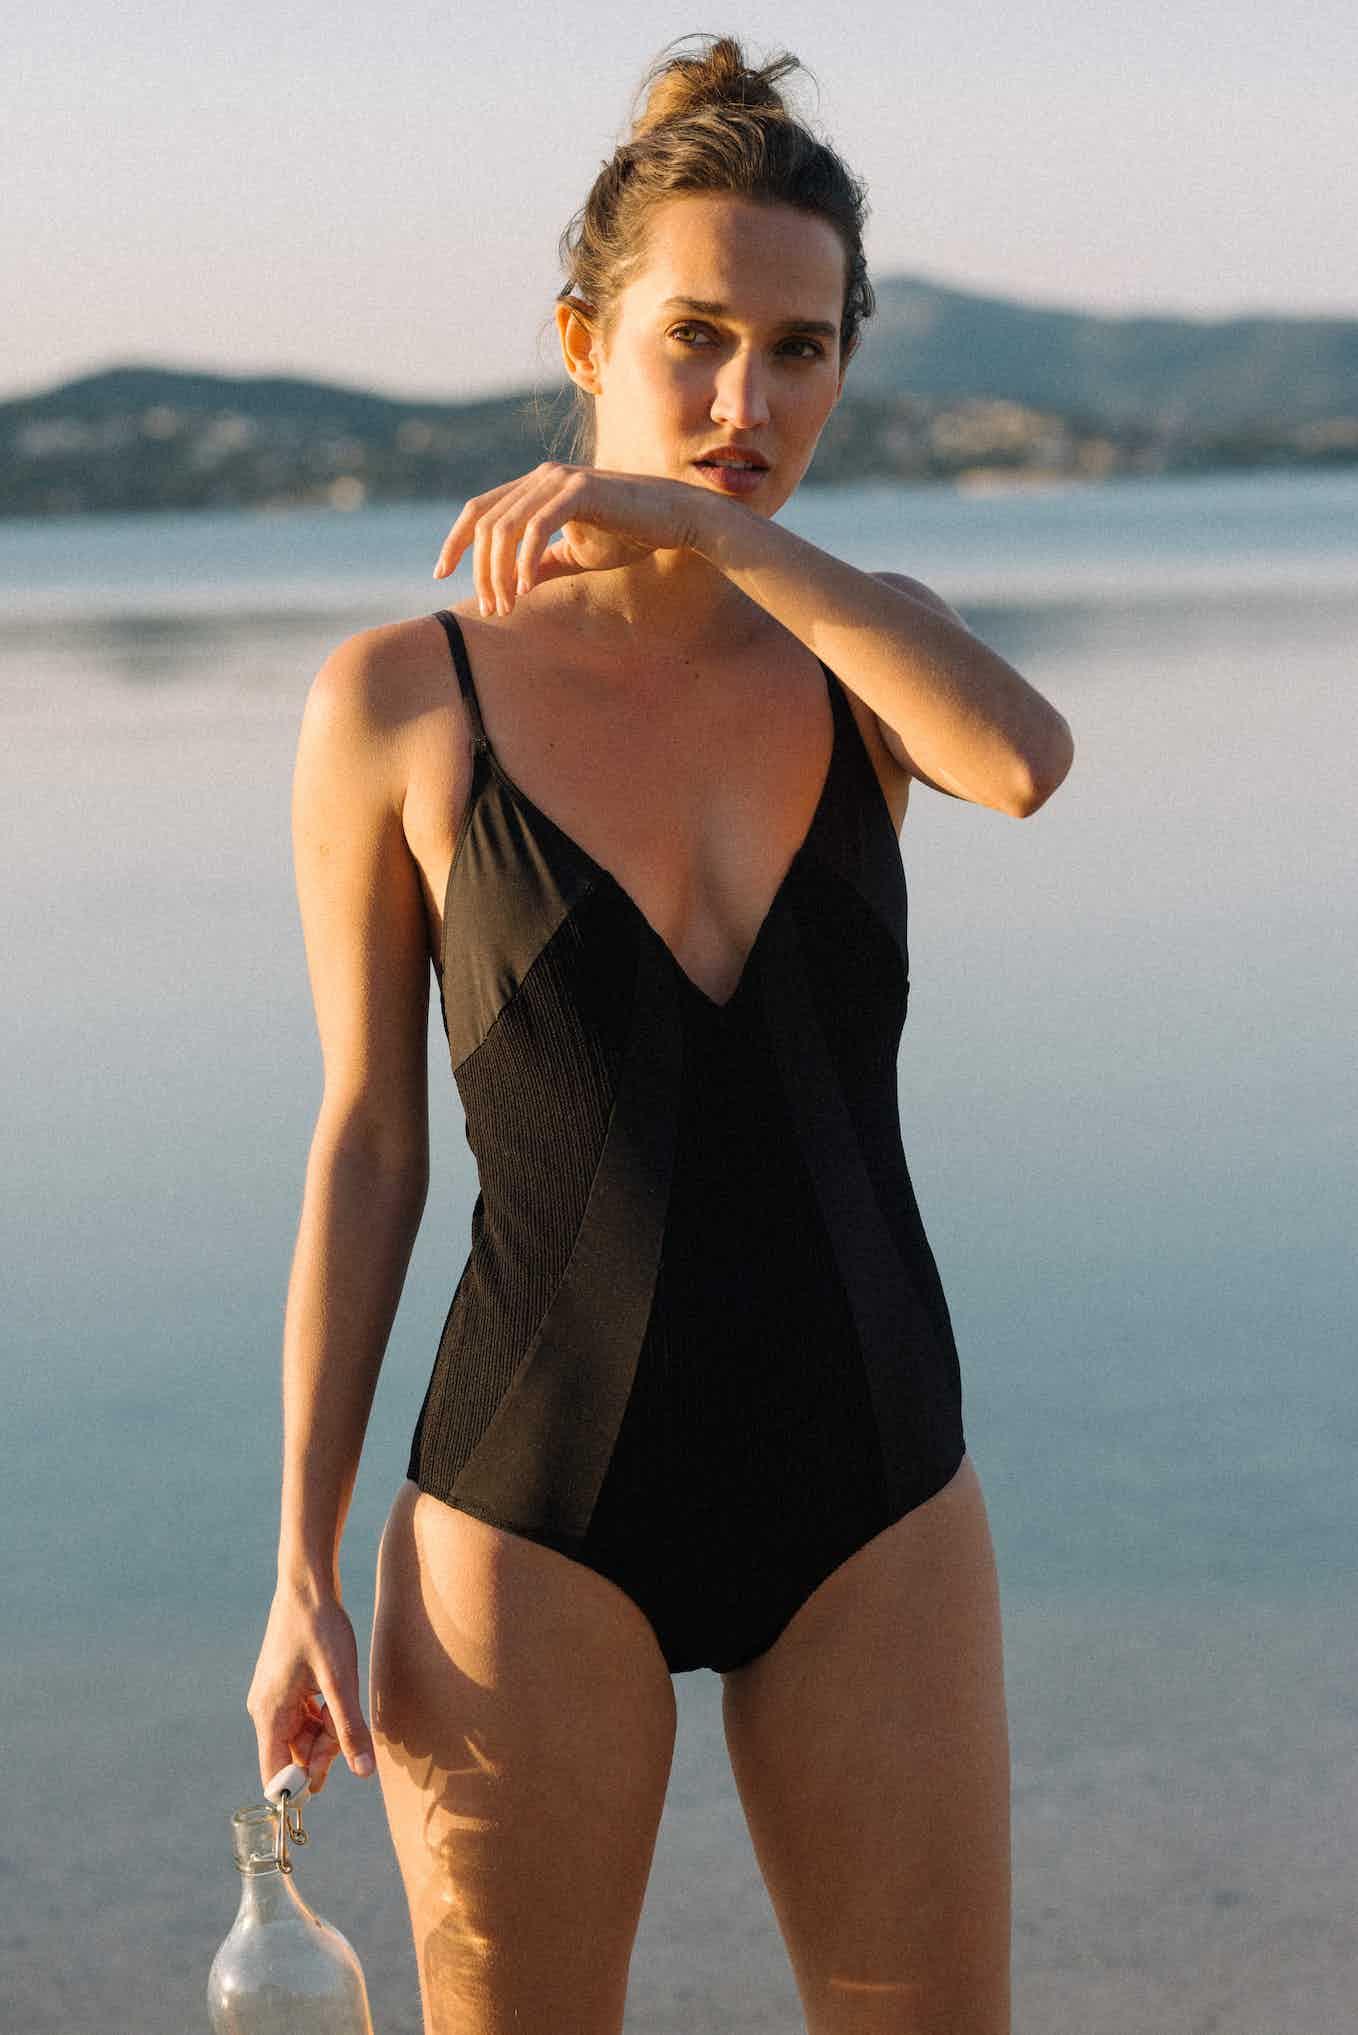 Swimsuit Soleil brûlant in black